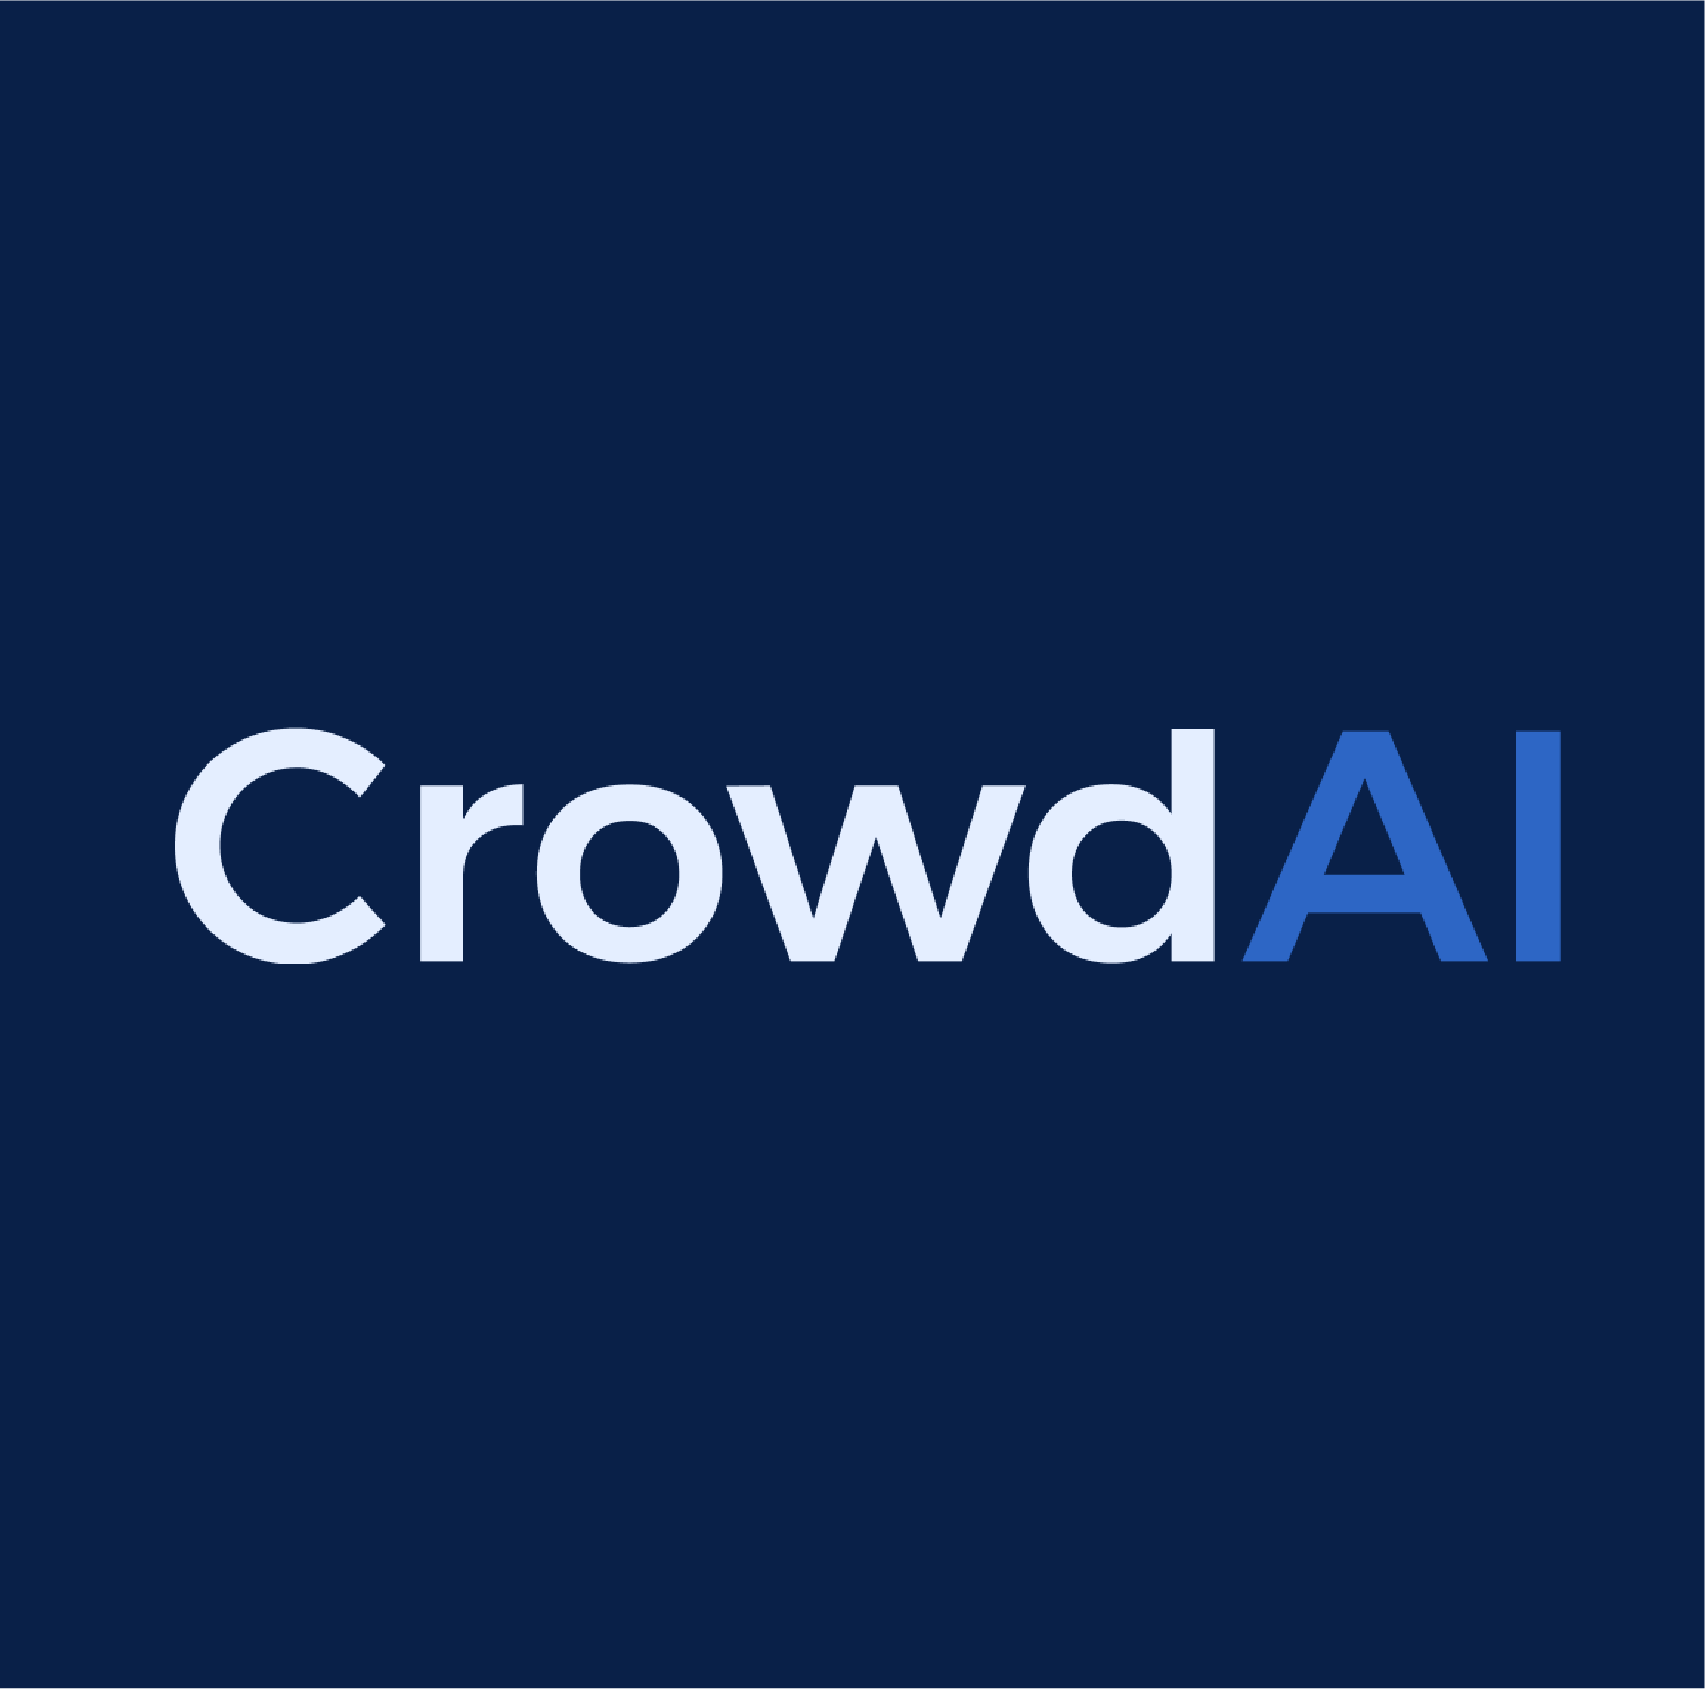 CrowdAI logo